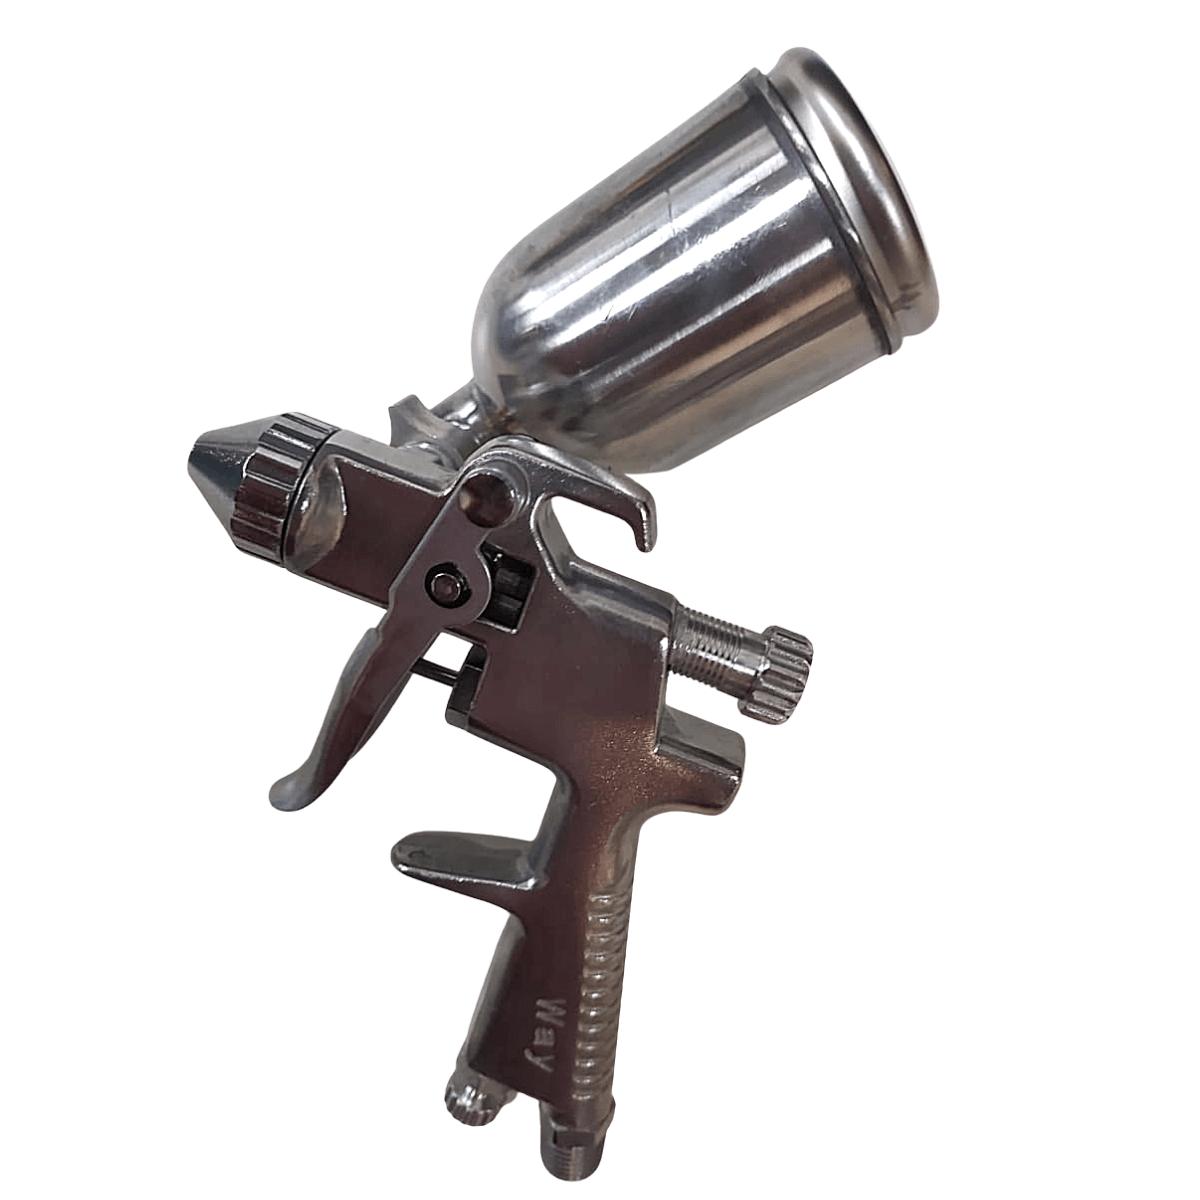 Pistola Pintura Gravidade Aerógrafo Bico 0,5 Mm 200 Ml K3